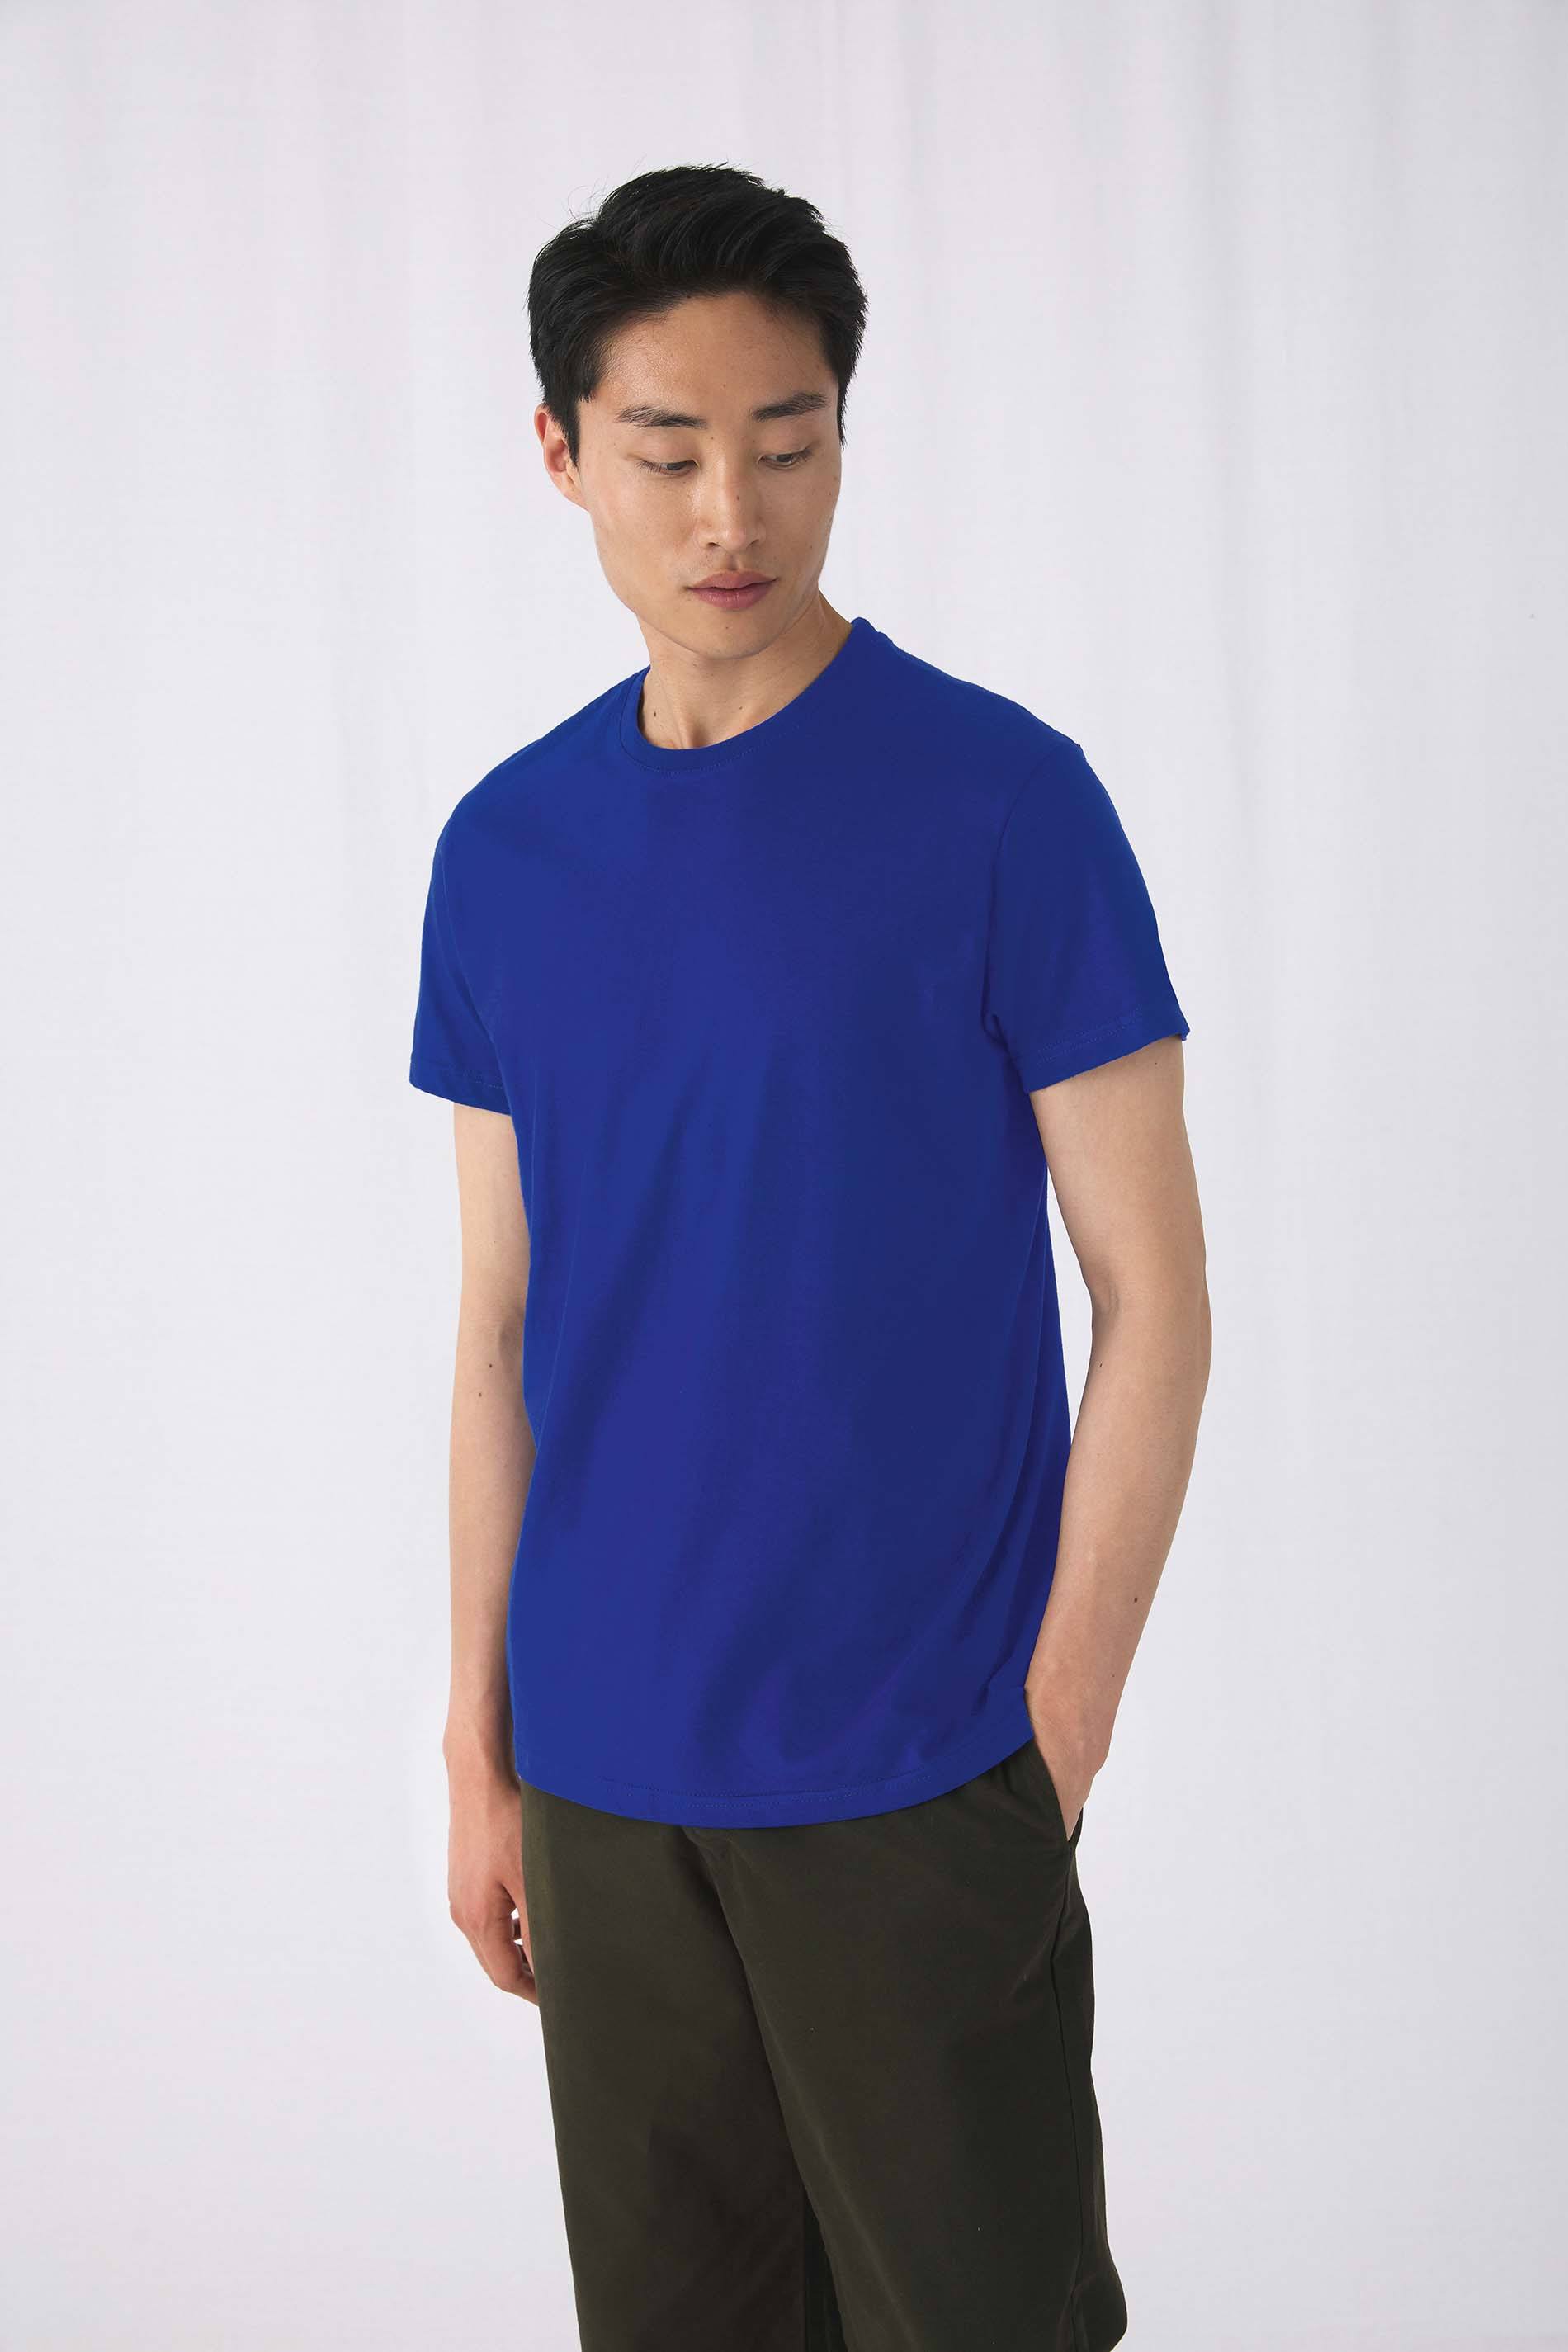 T-shirt #E190 - B&C